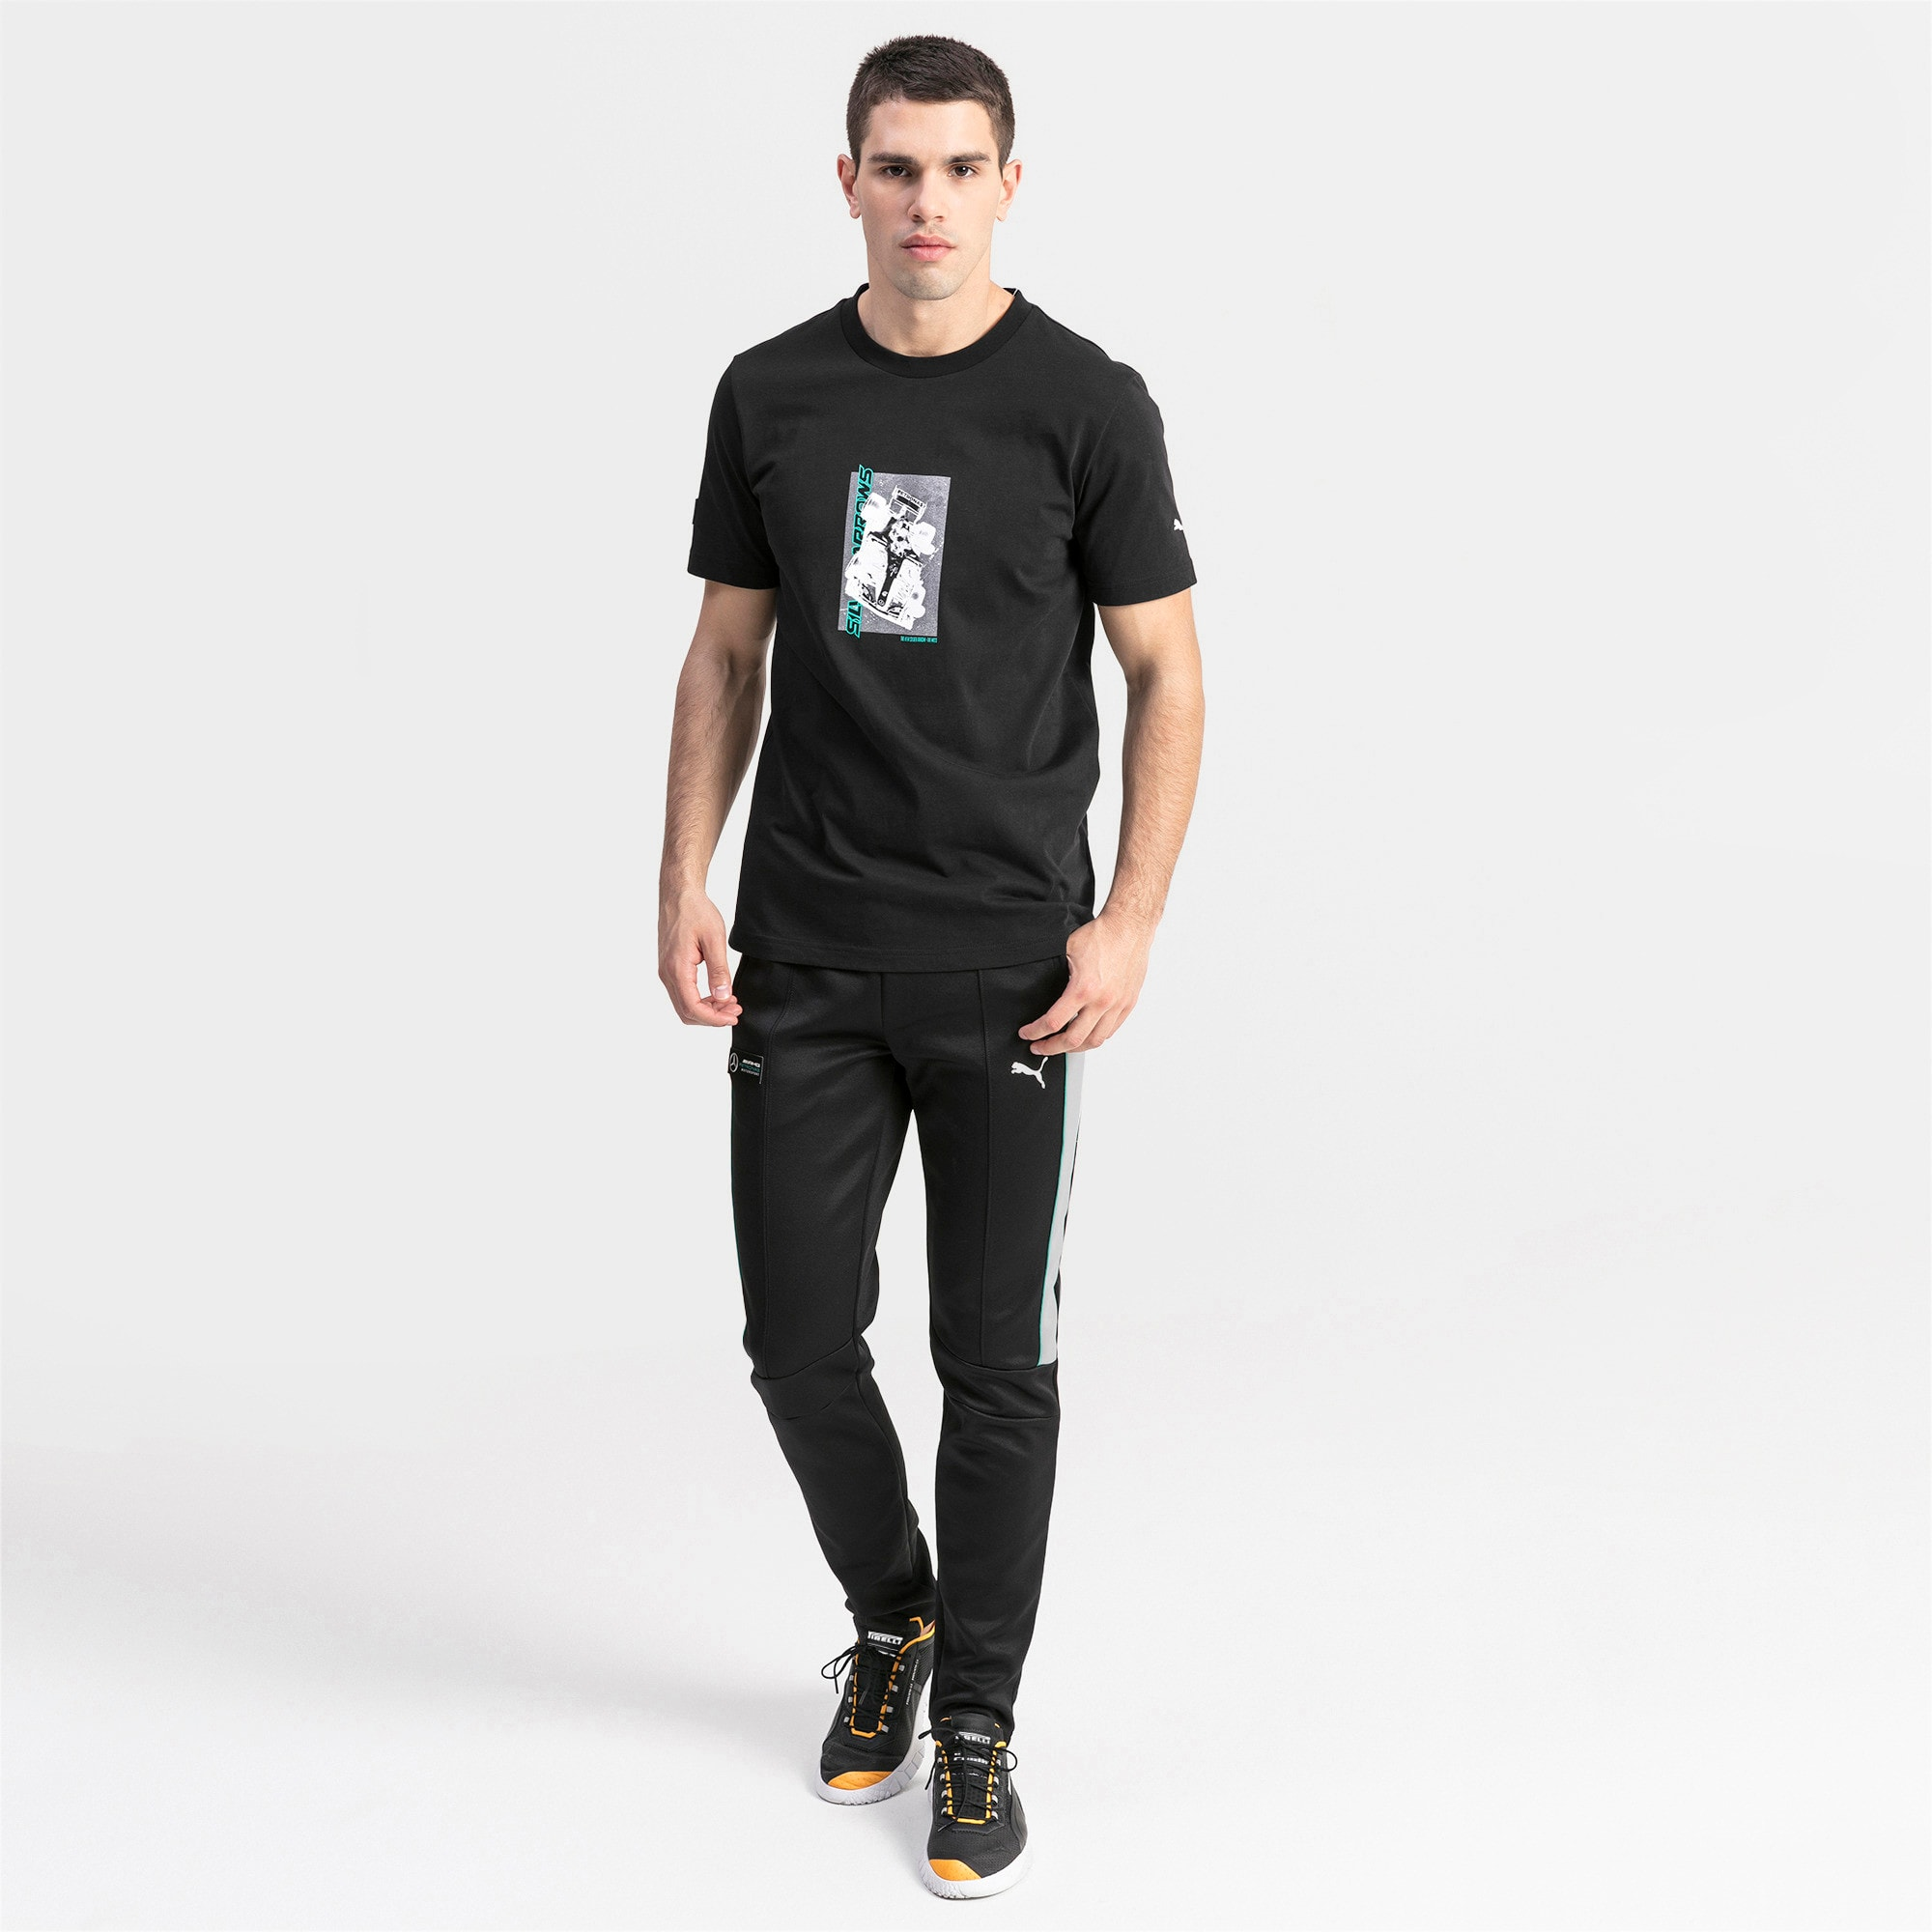 Thumbnail 3 of T-shirt con stampa Mercedes AMG Petronas uomo, Puma Black, medium